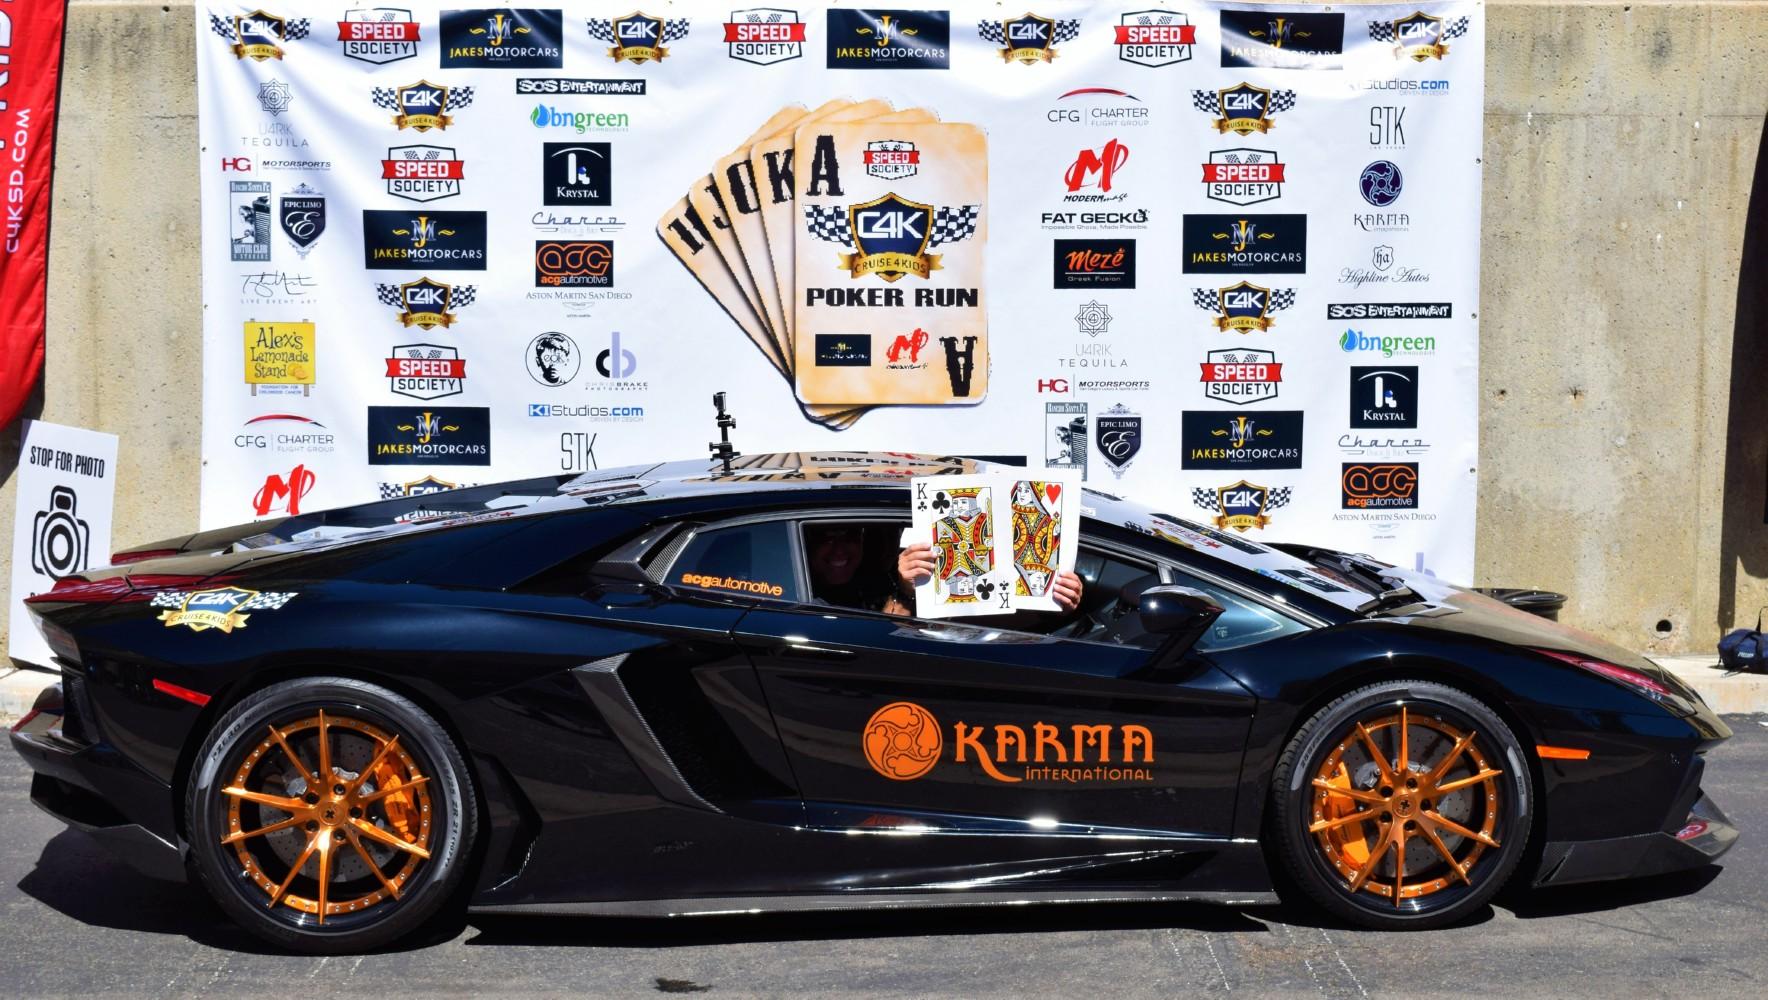 Poker Run 2017 Banner Photos - 28.jpg